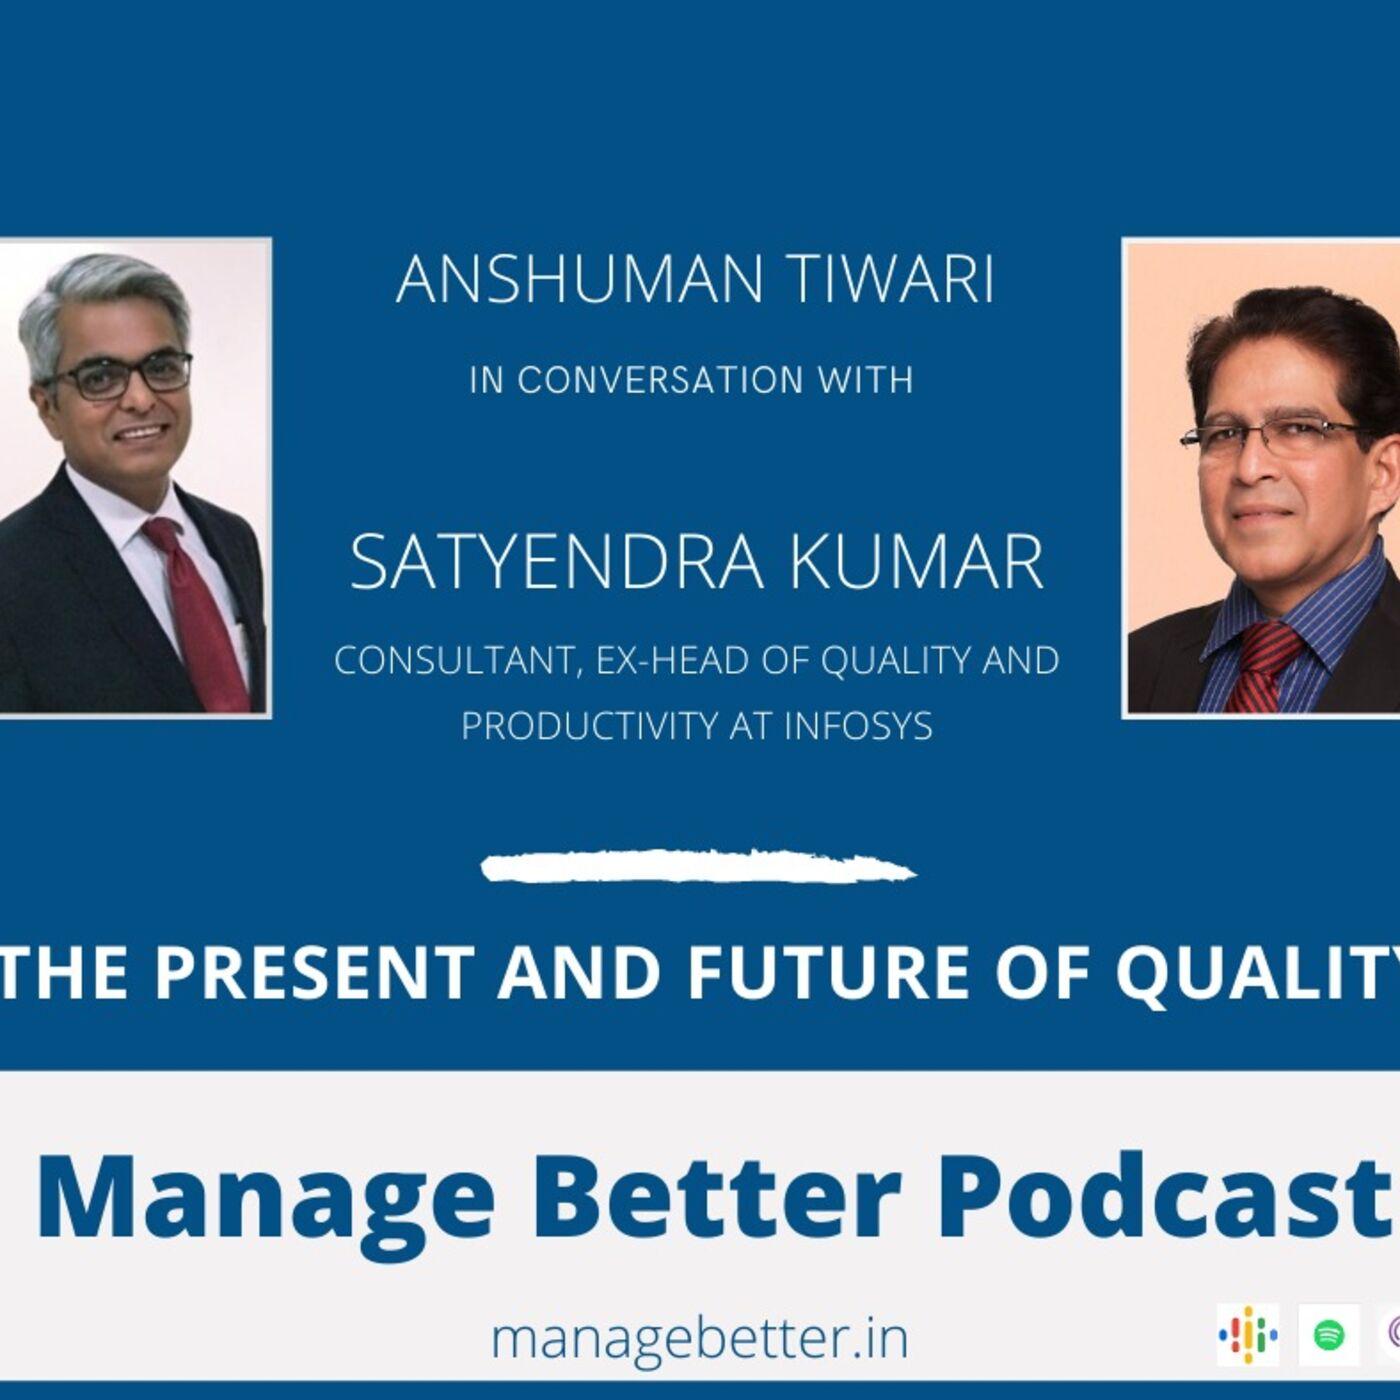 Satyendra Kumar on Present and Future of Quality